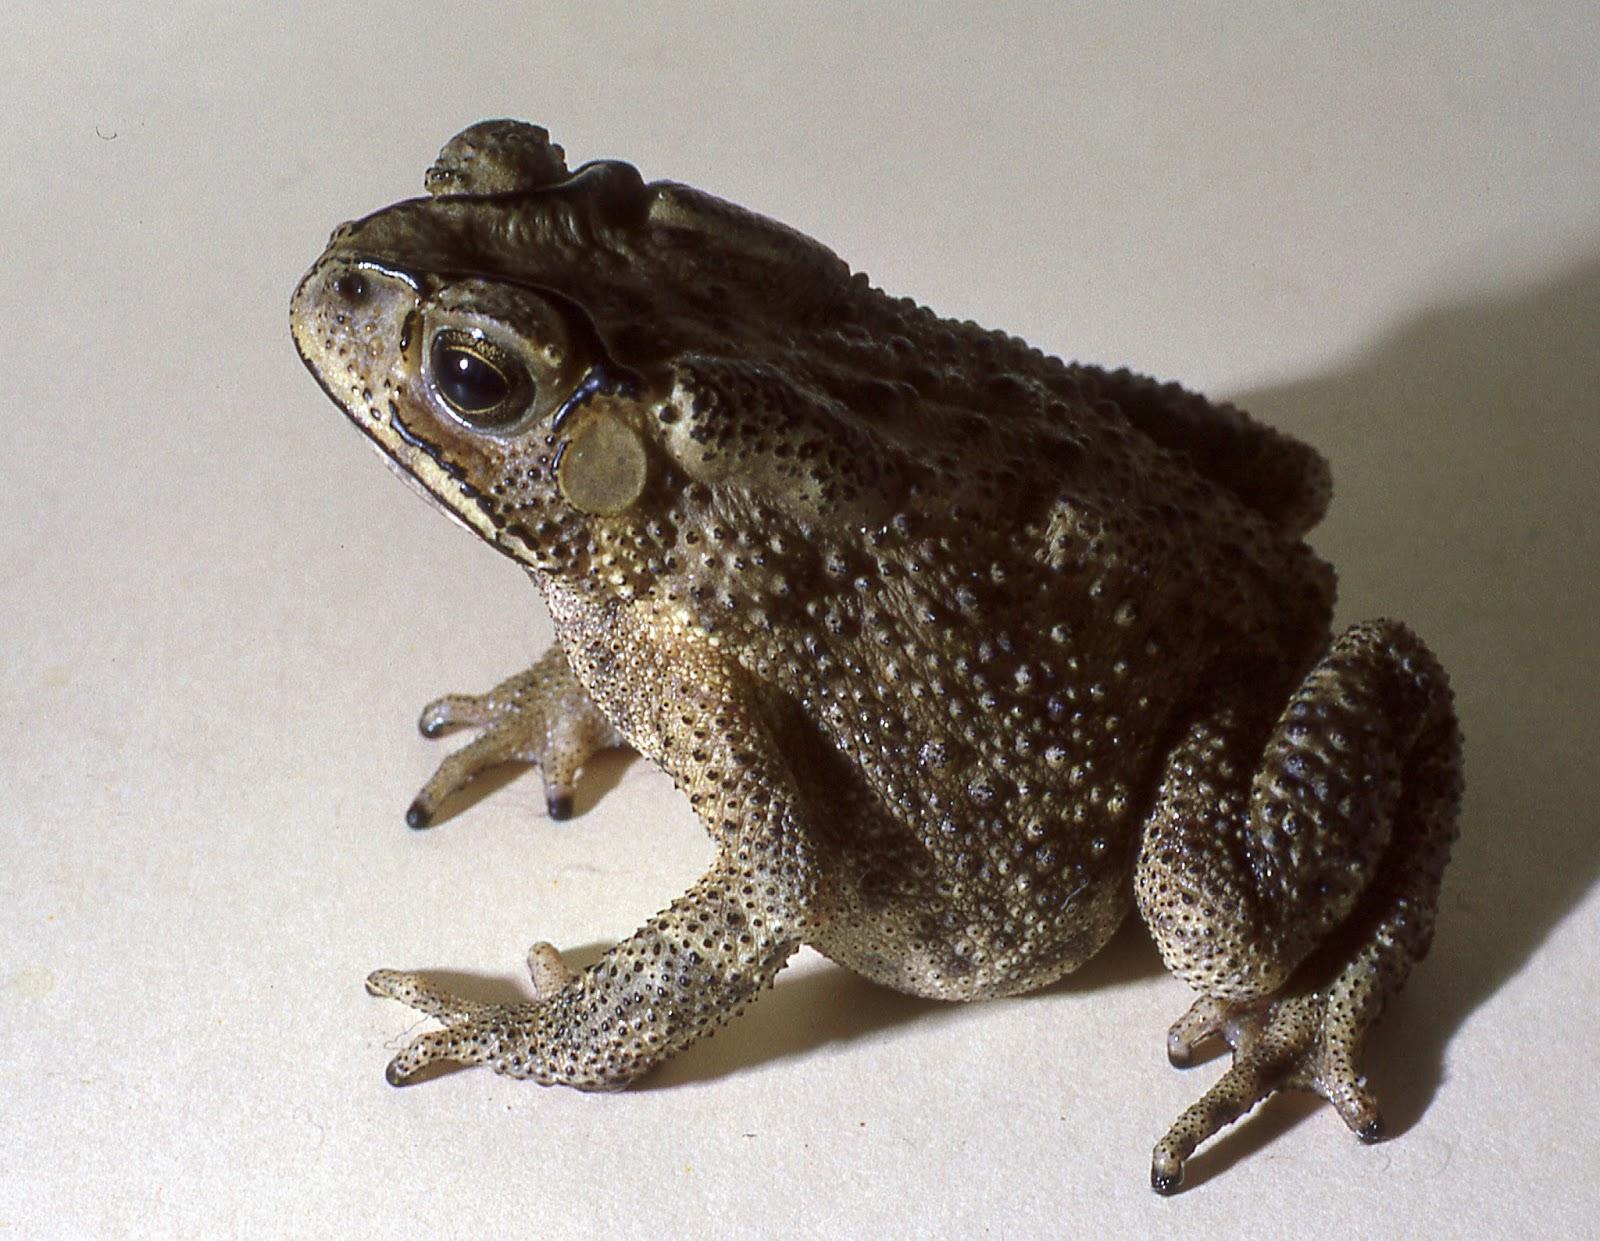 Asian river toads habitat